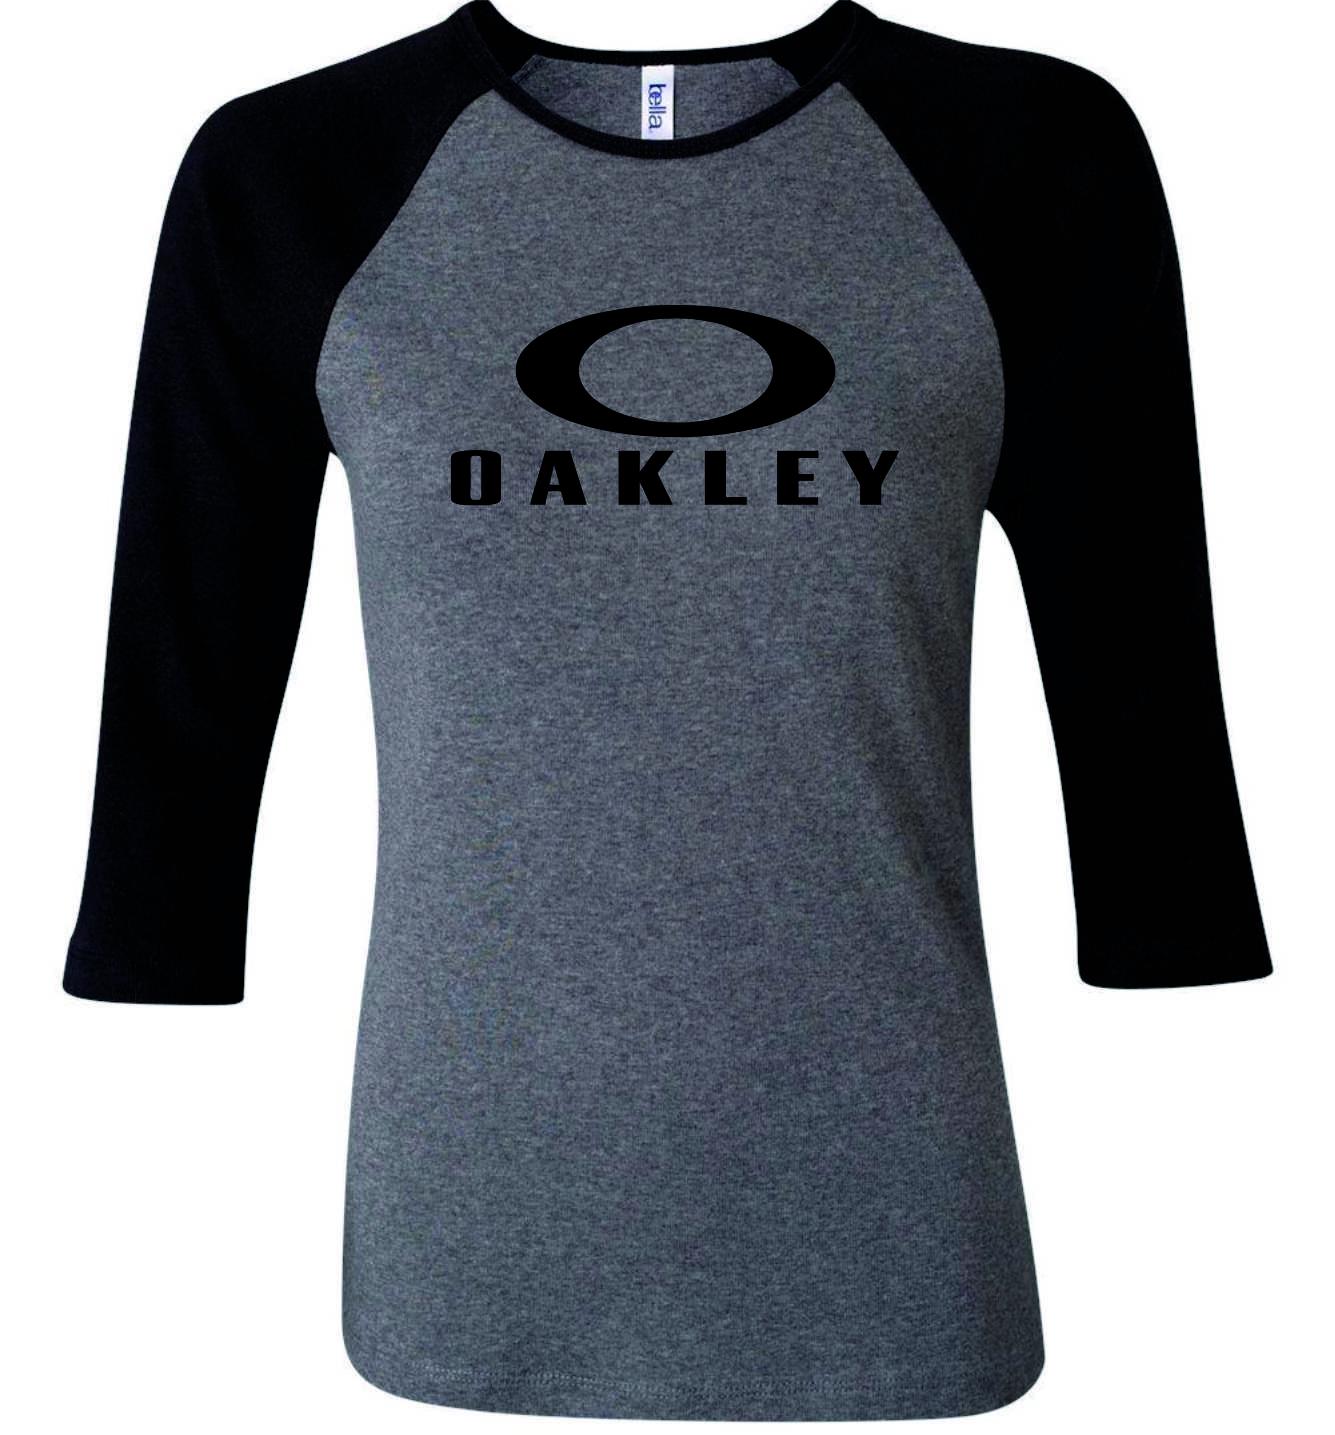 cdb07f7b56 Camiseta Raglan Oakley manga 3 4 Cinza no Elo7